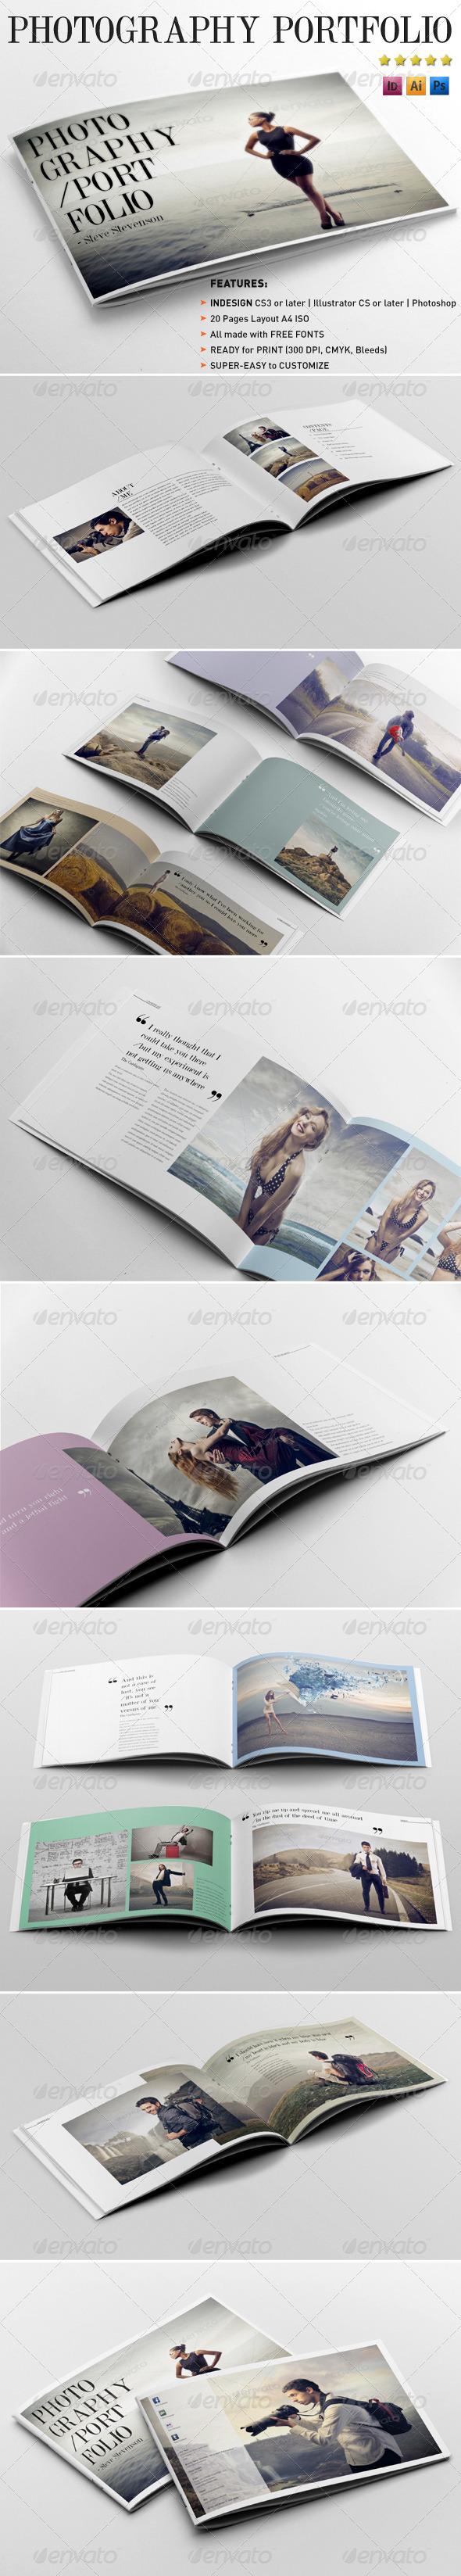 GraphicRiver Photography Portfolio Template 4245809